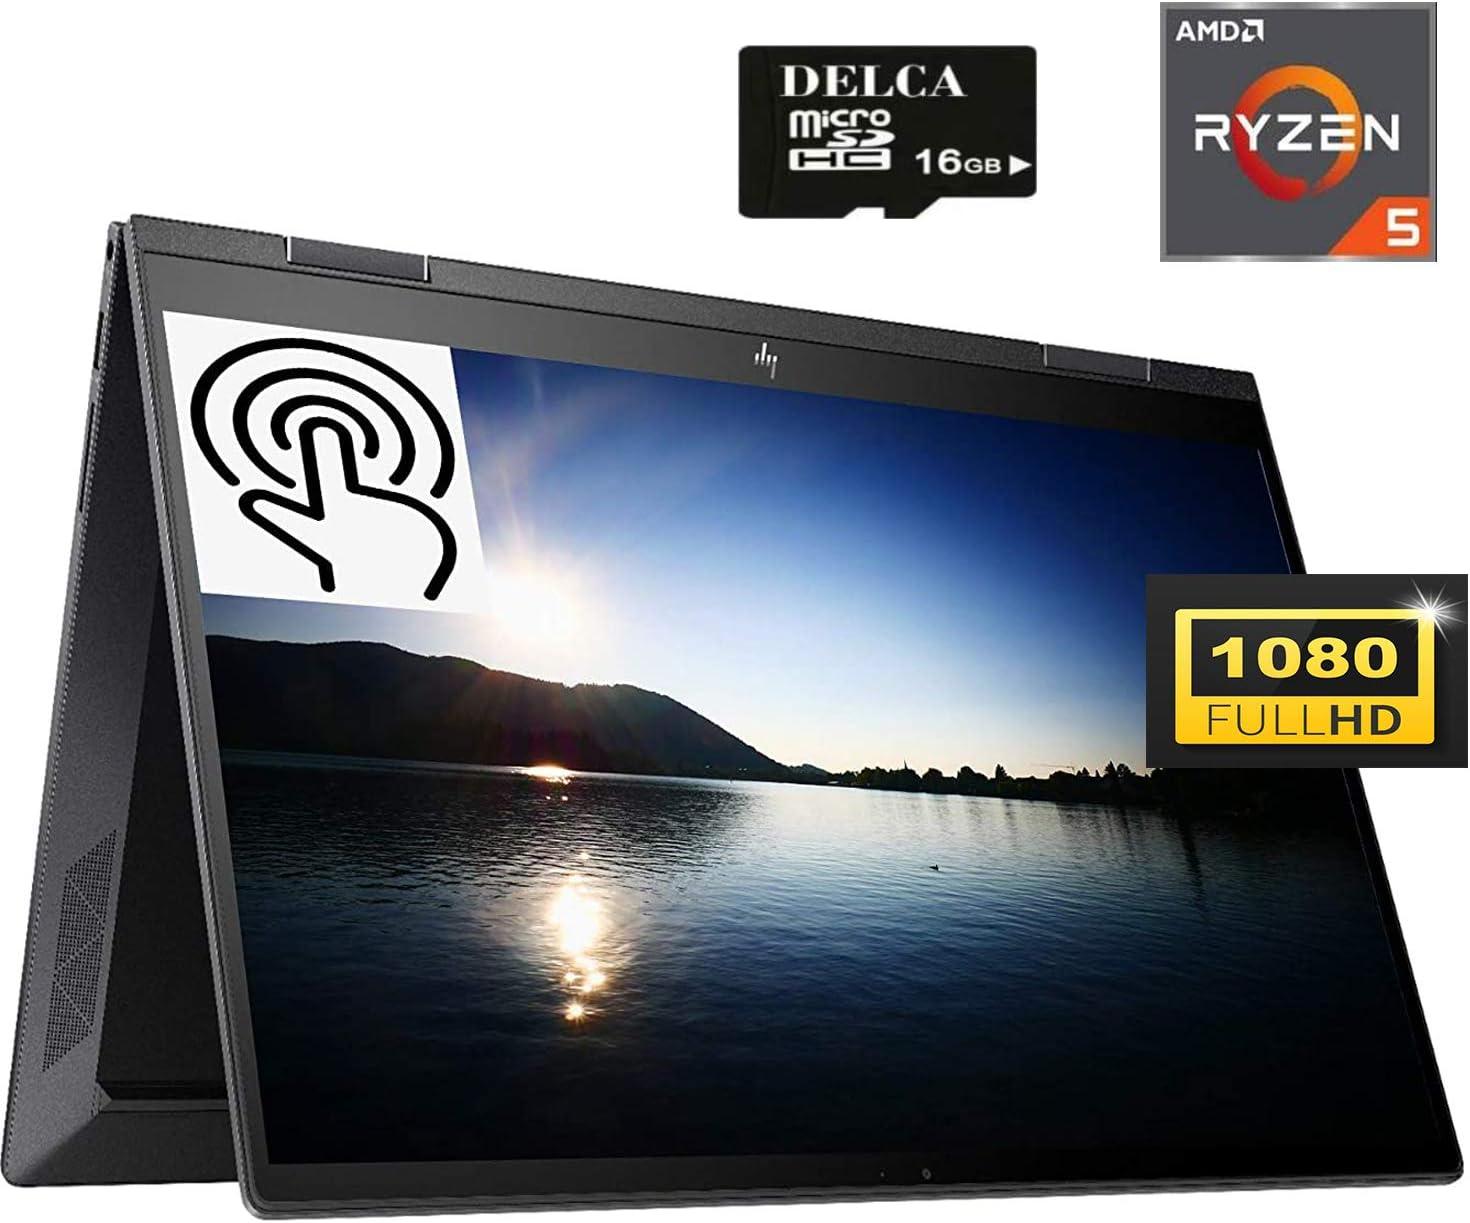 "HP Envy X360 2020 Premium 2 in 1 Business Laptop I 15.6""FHD IPS Touchscreen I AMD Hexa-Core Ryzen 5 4500U (>i7-8550U) I 8GB DDR4 512GB PCIe SSD I AlexaBacklit FP Win 10 + Delca 16GB Micro SD Card"